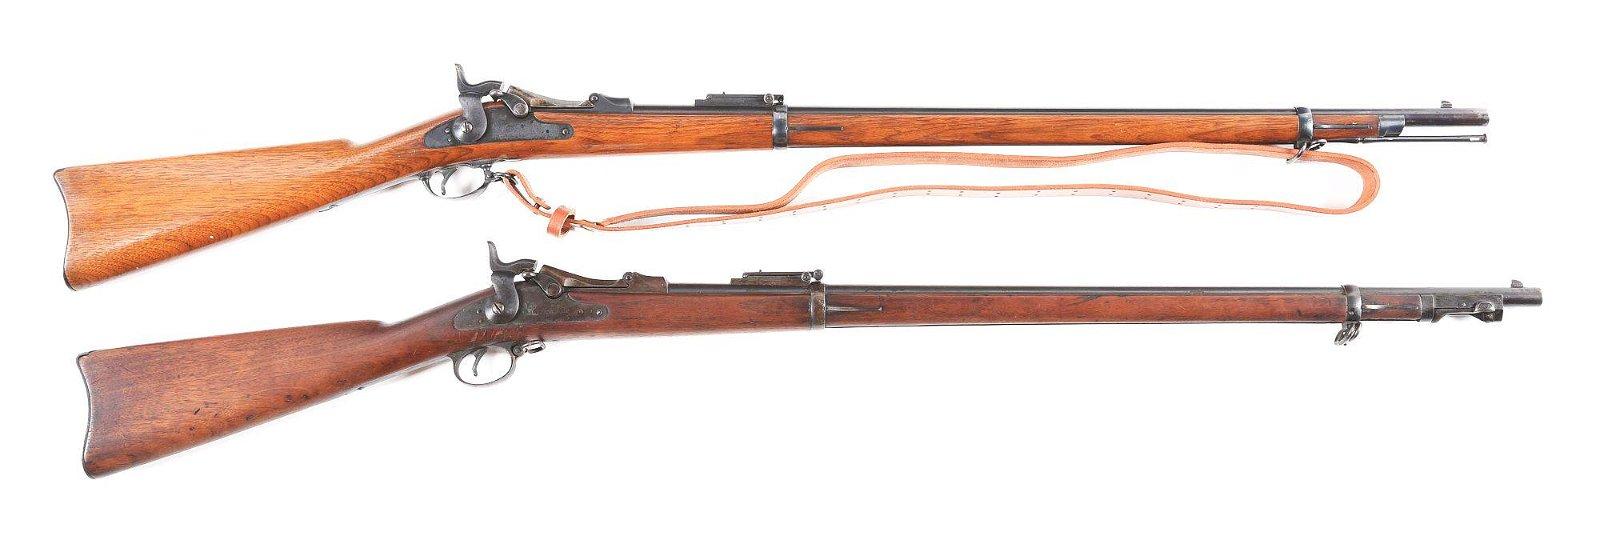 (C) SHOOTERS LOT OF 2 SPRINGFIELD TRAPDOOR RIFLES.